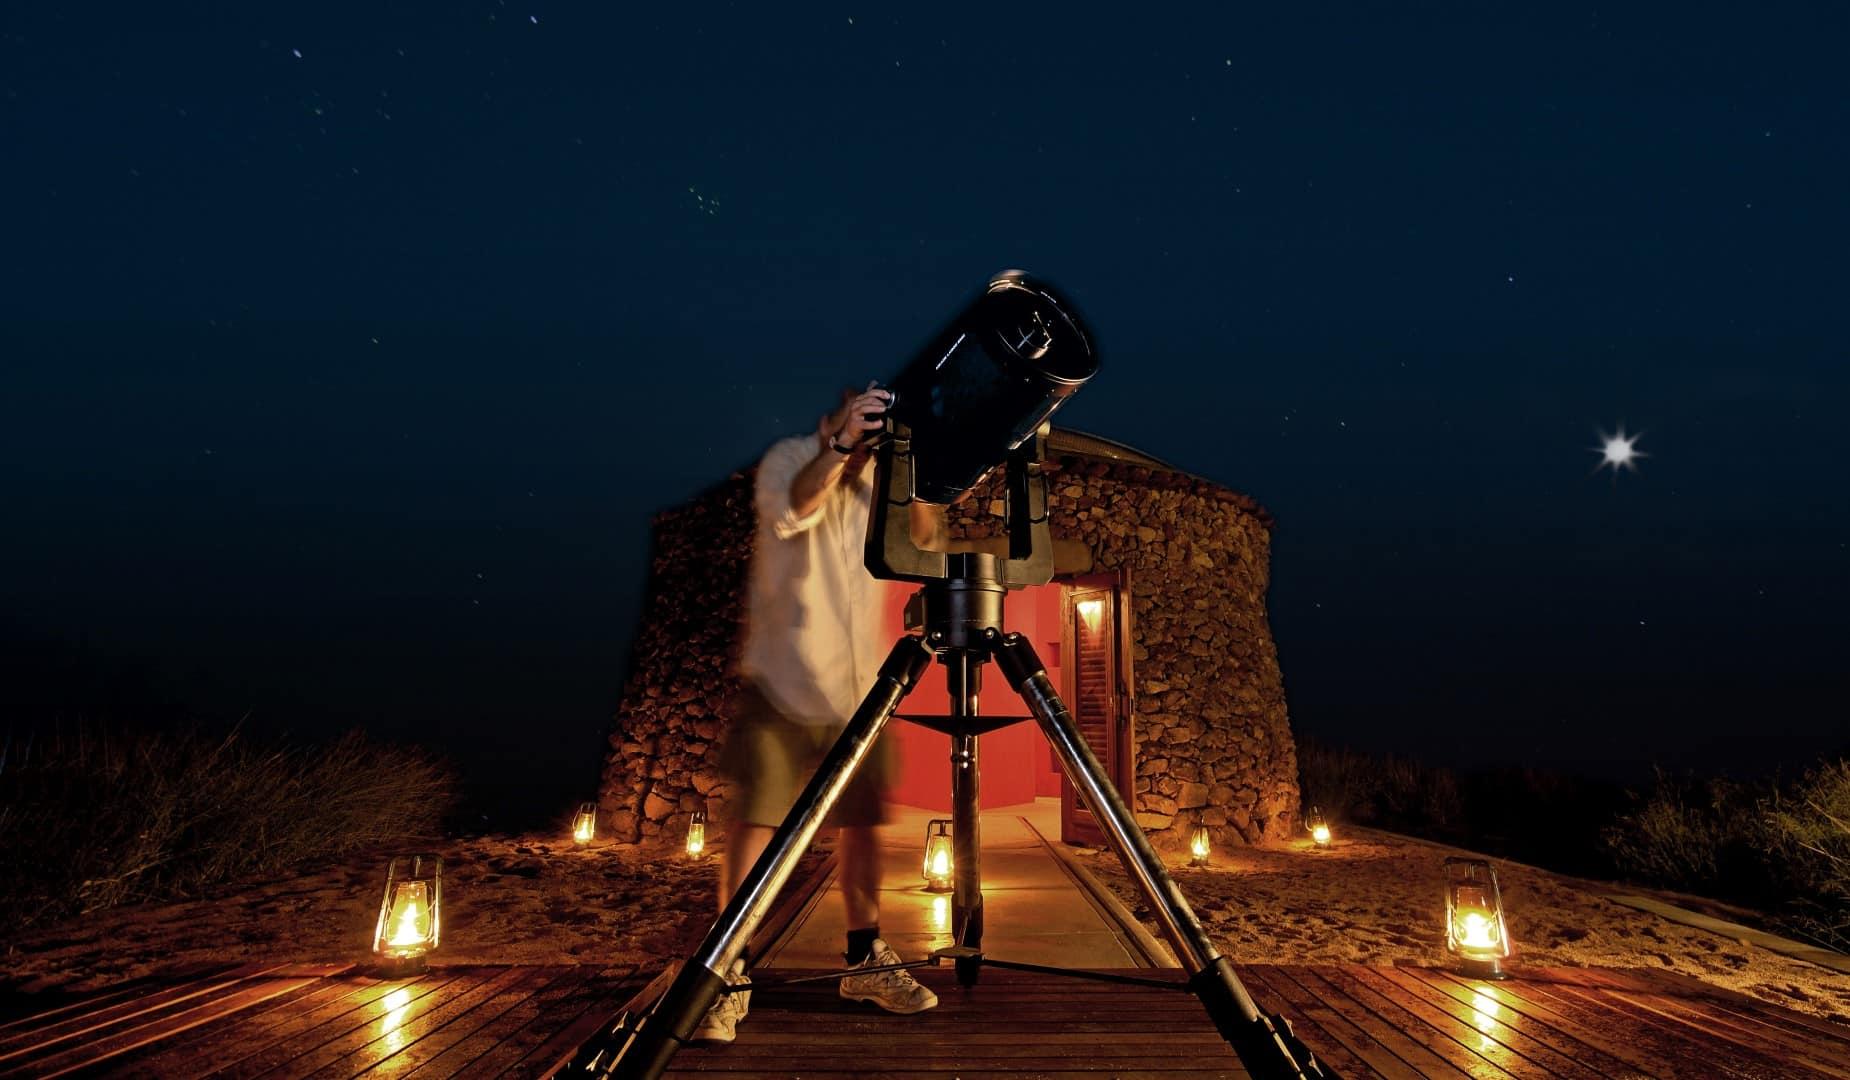 Ulusaba bush observatory